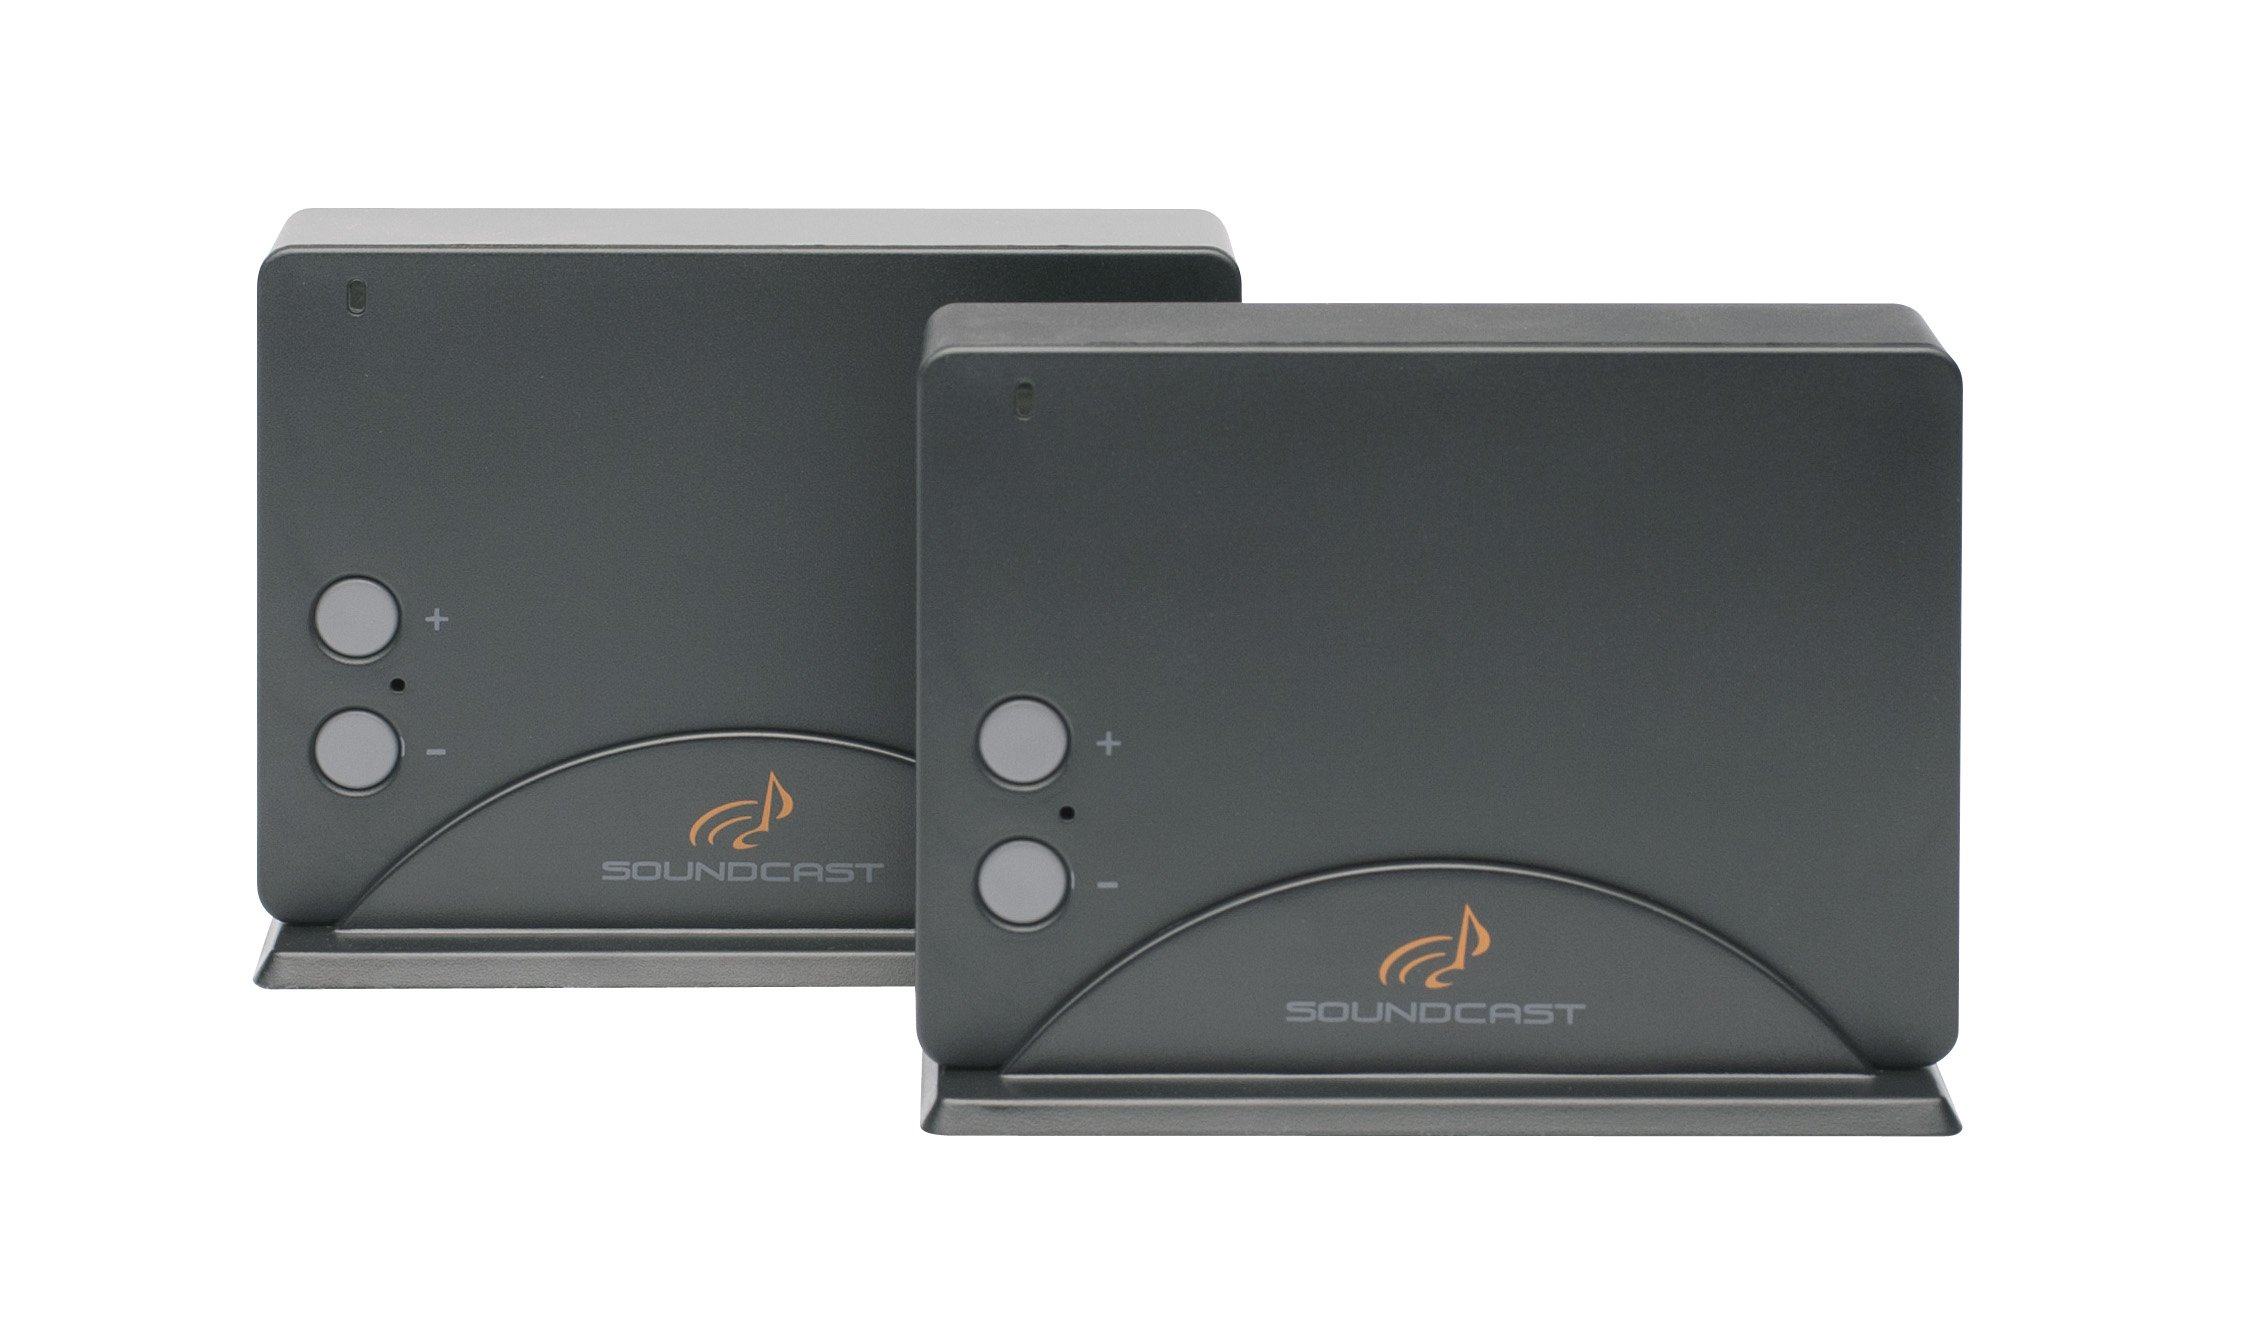 Soundcast SurroundCast - Wireless Receiver / Transmitter Audio System